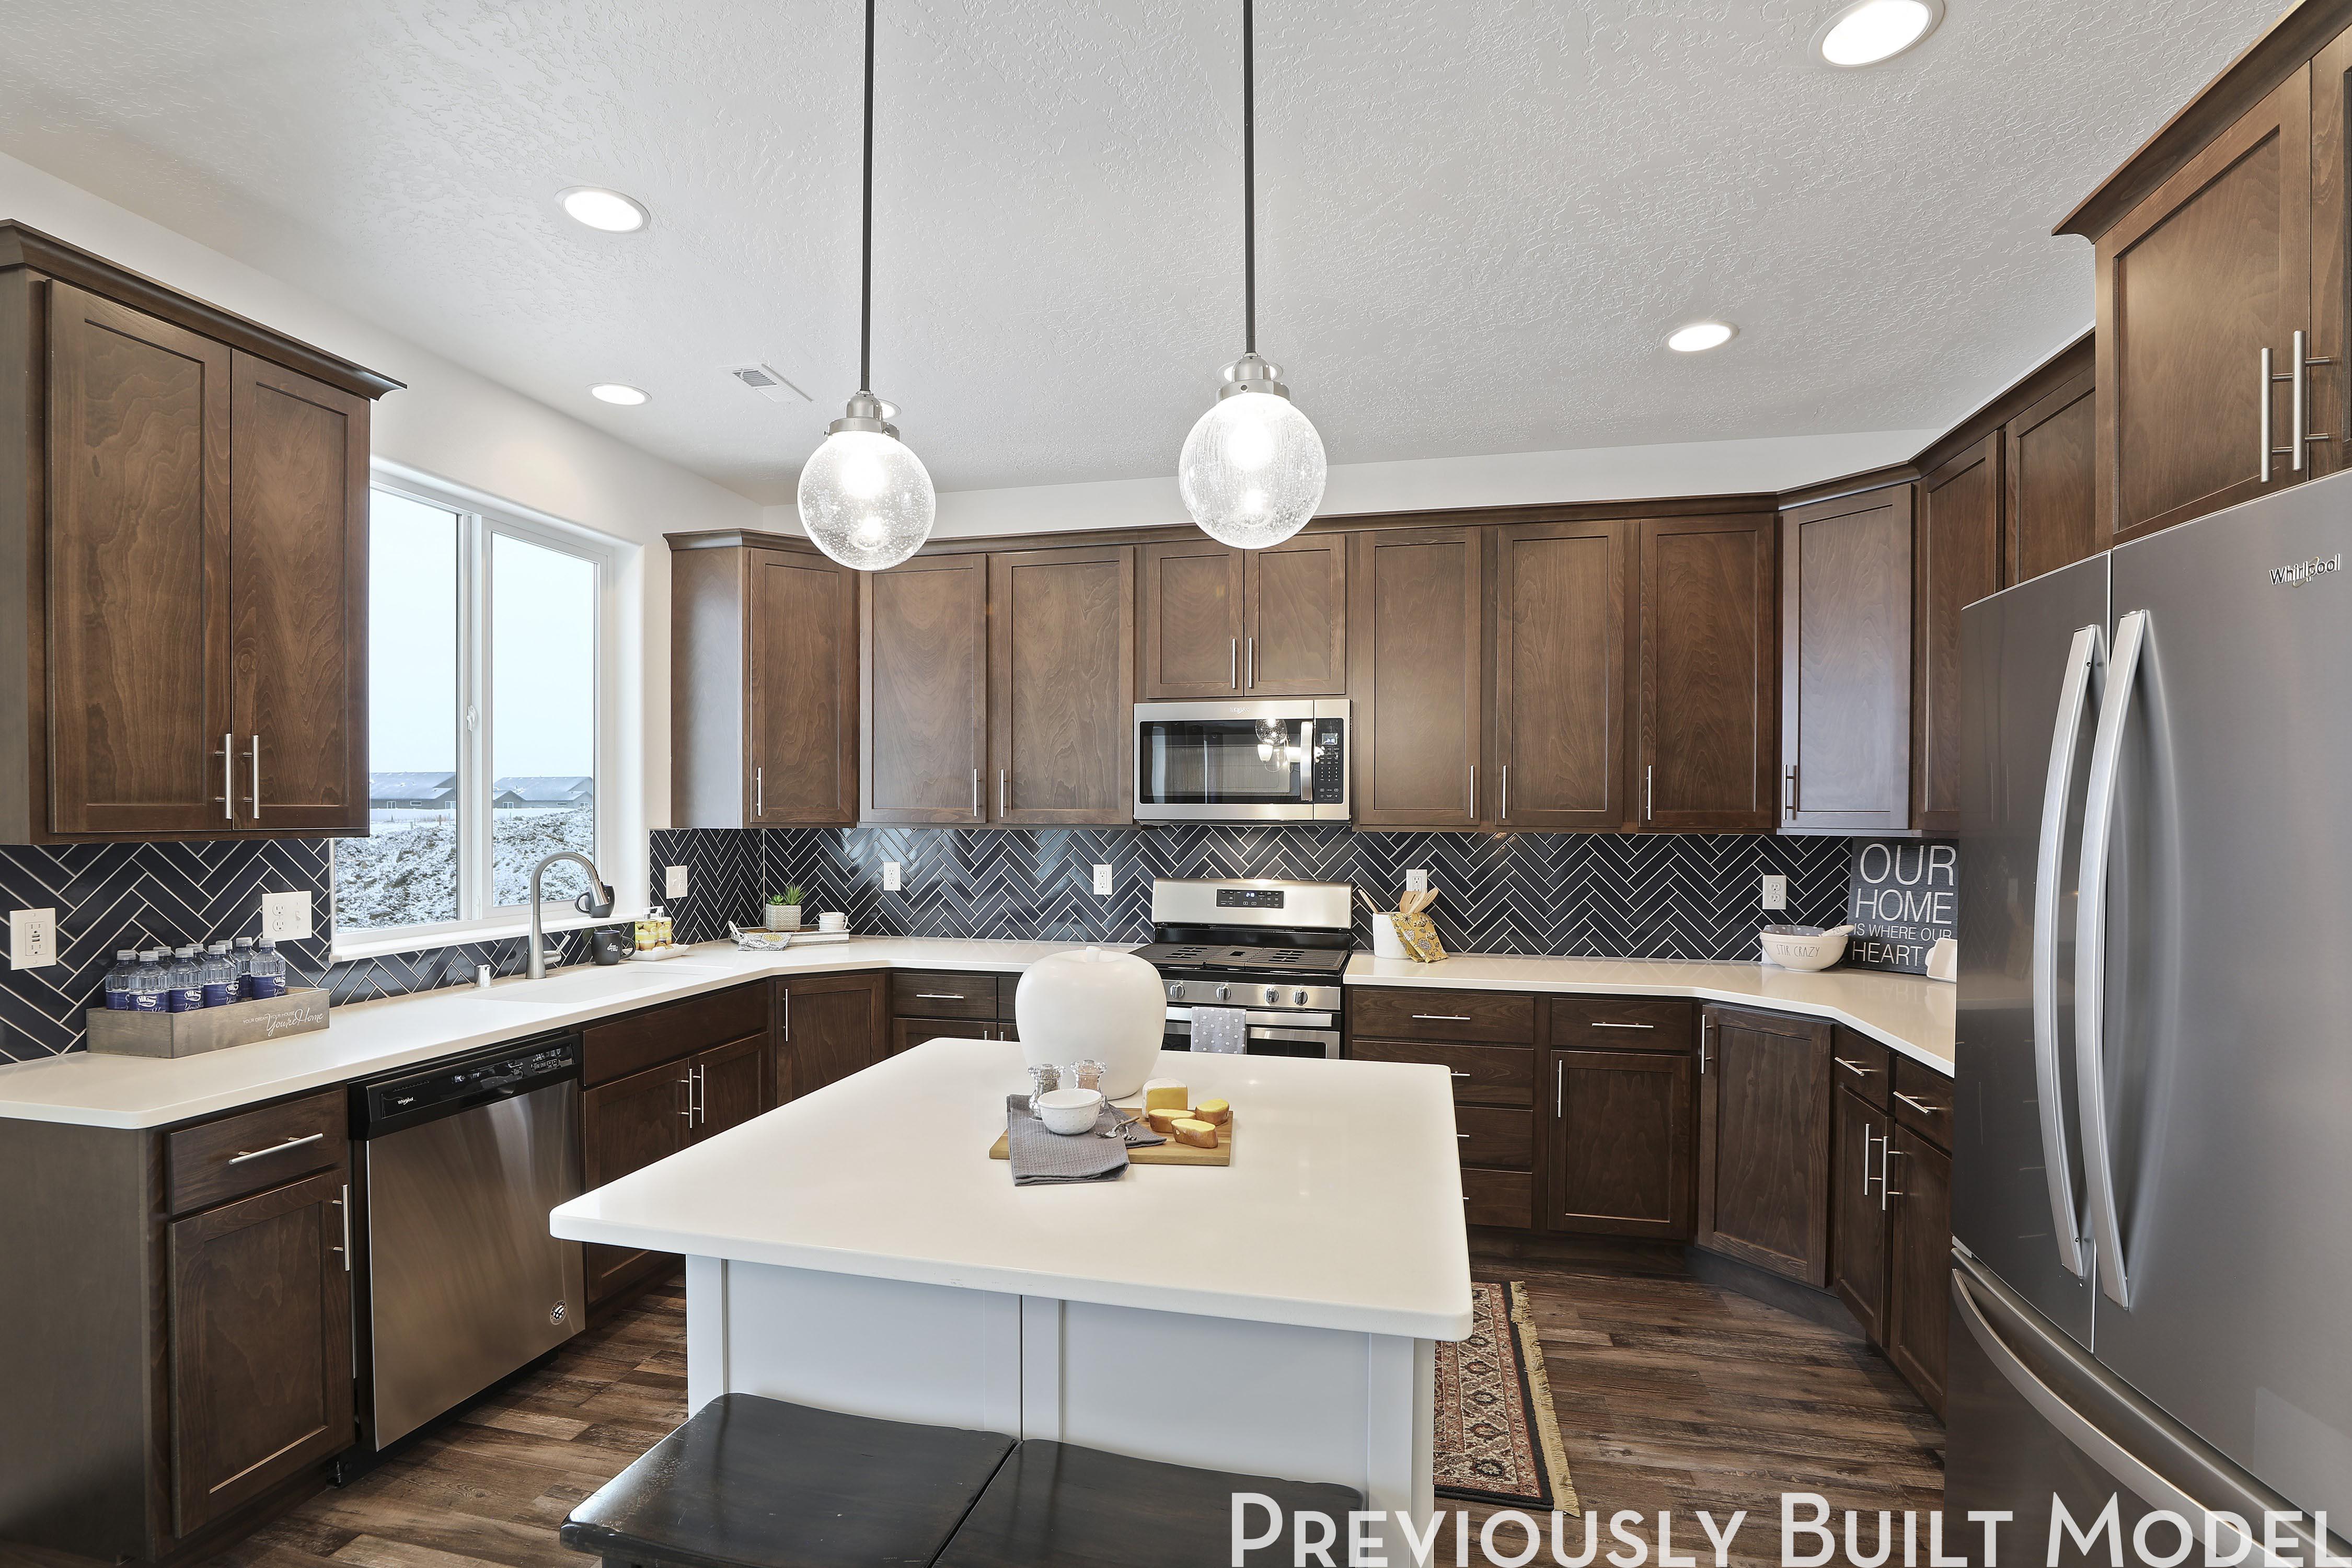 Kitchen featured in The Windsor By RYN Built Homes in Spokane-Couer d Alene, WA